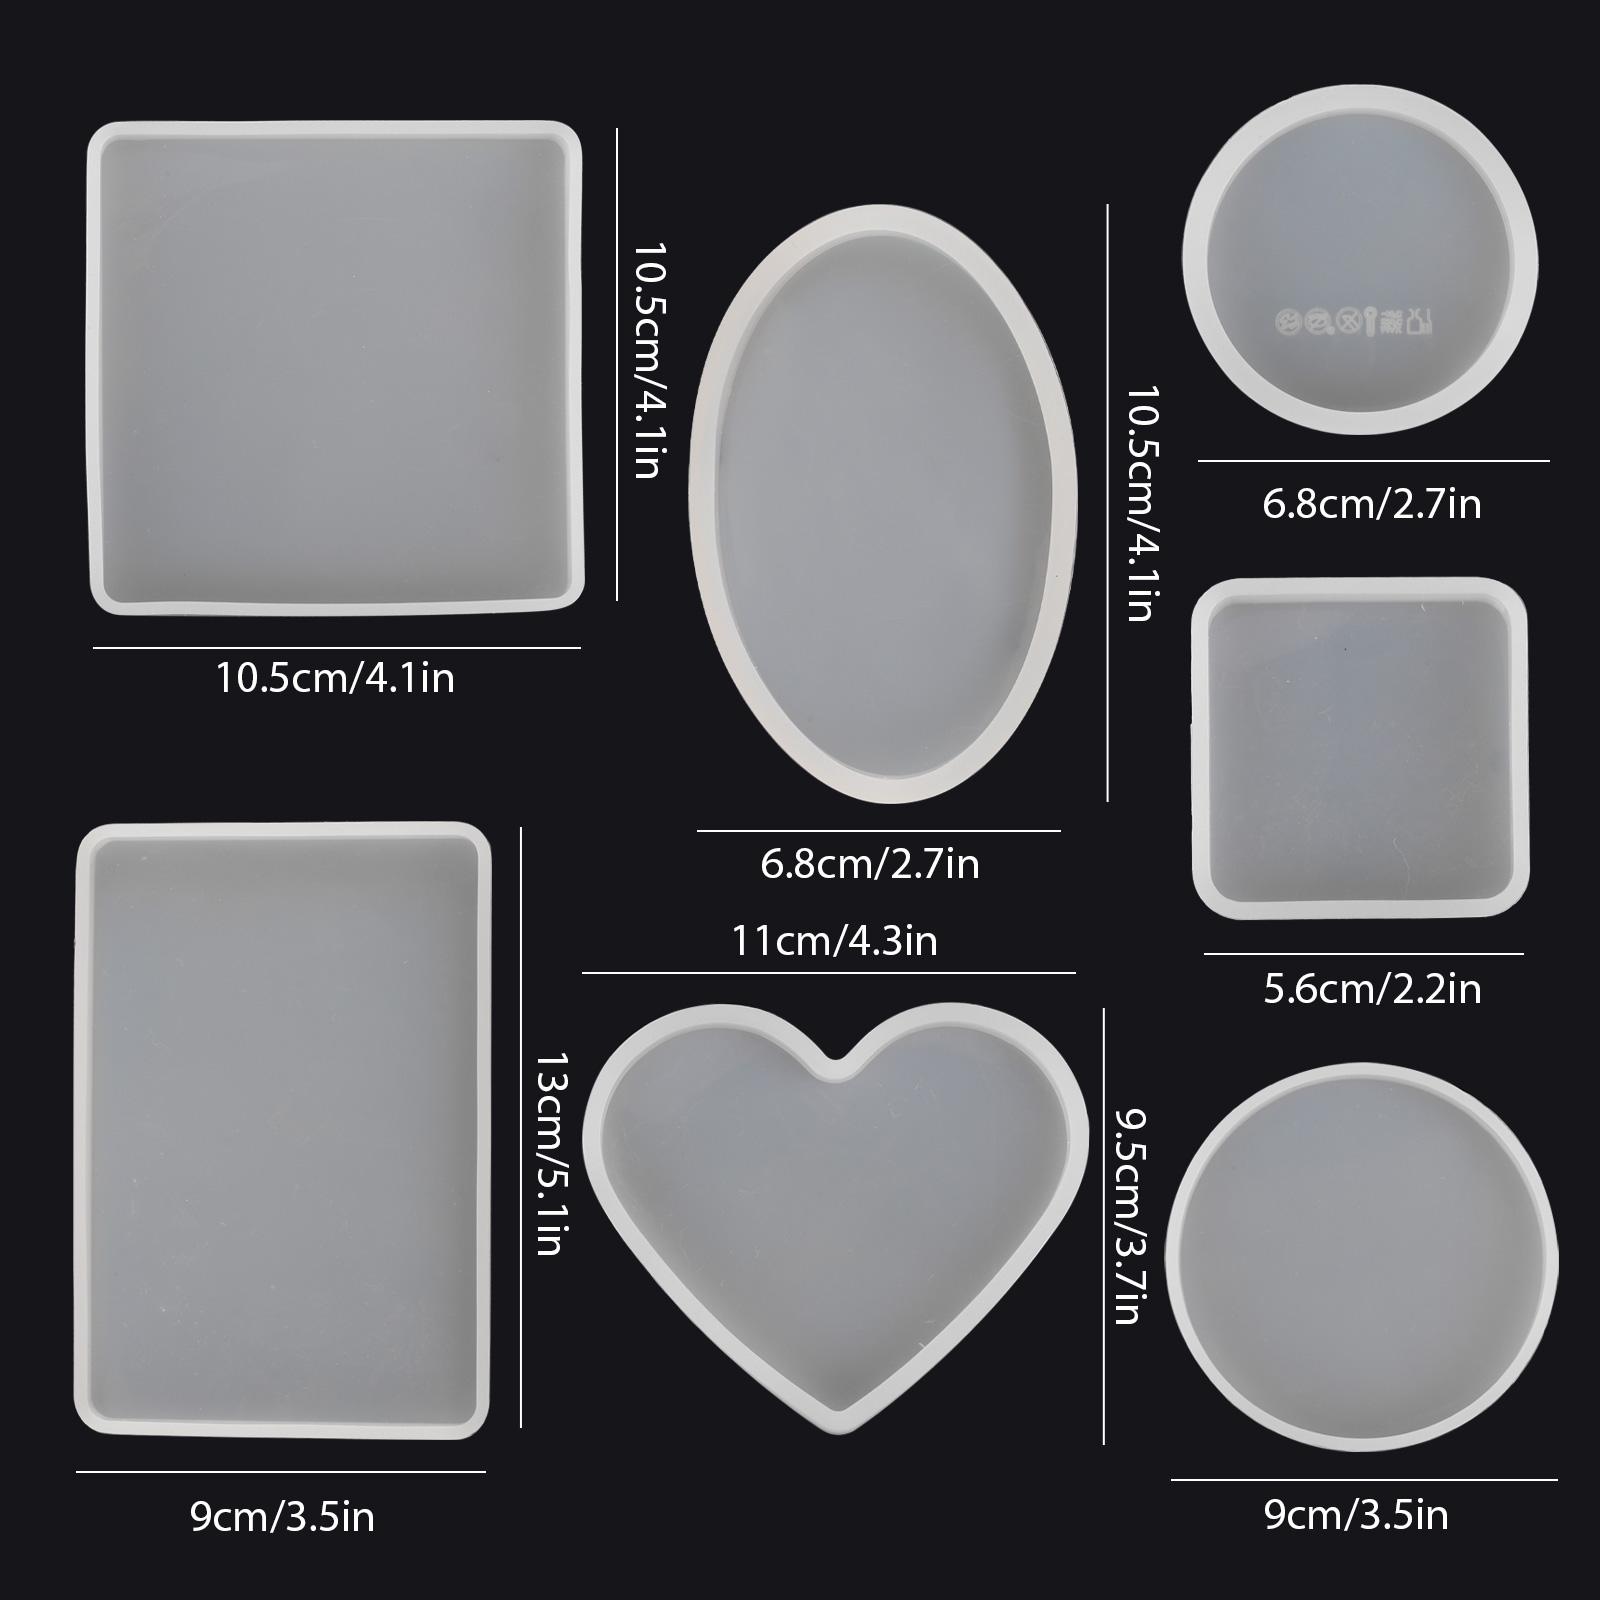 Silicone-Resin-Molds-Epoxy-Casting-Art-Coaster-Ashtray-Bowl-Mat-DIY-Craft-Tool thumbnail 8